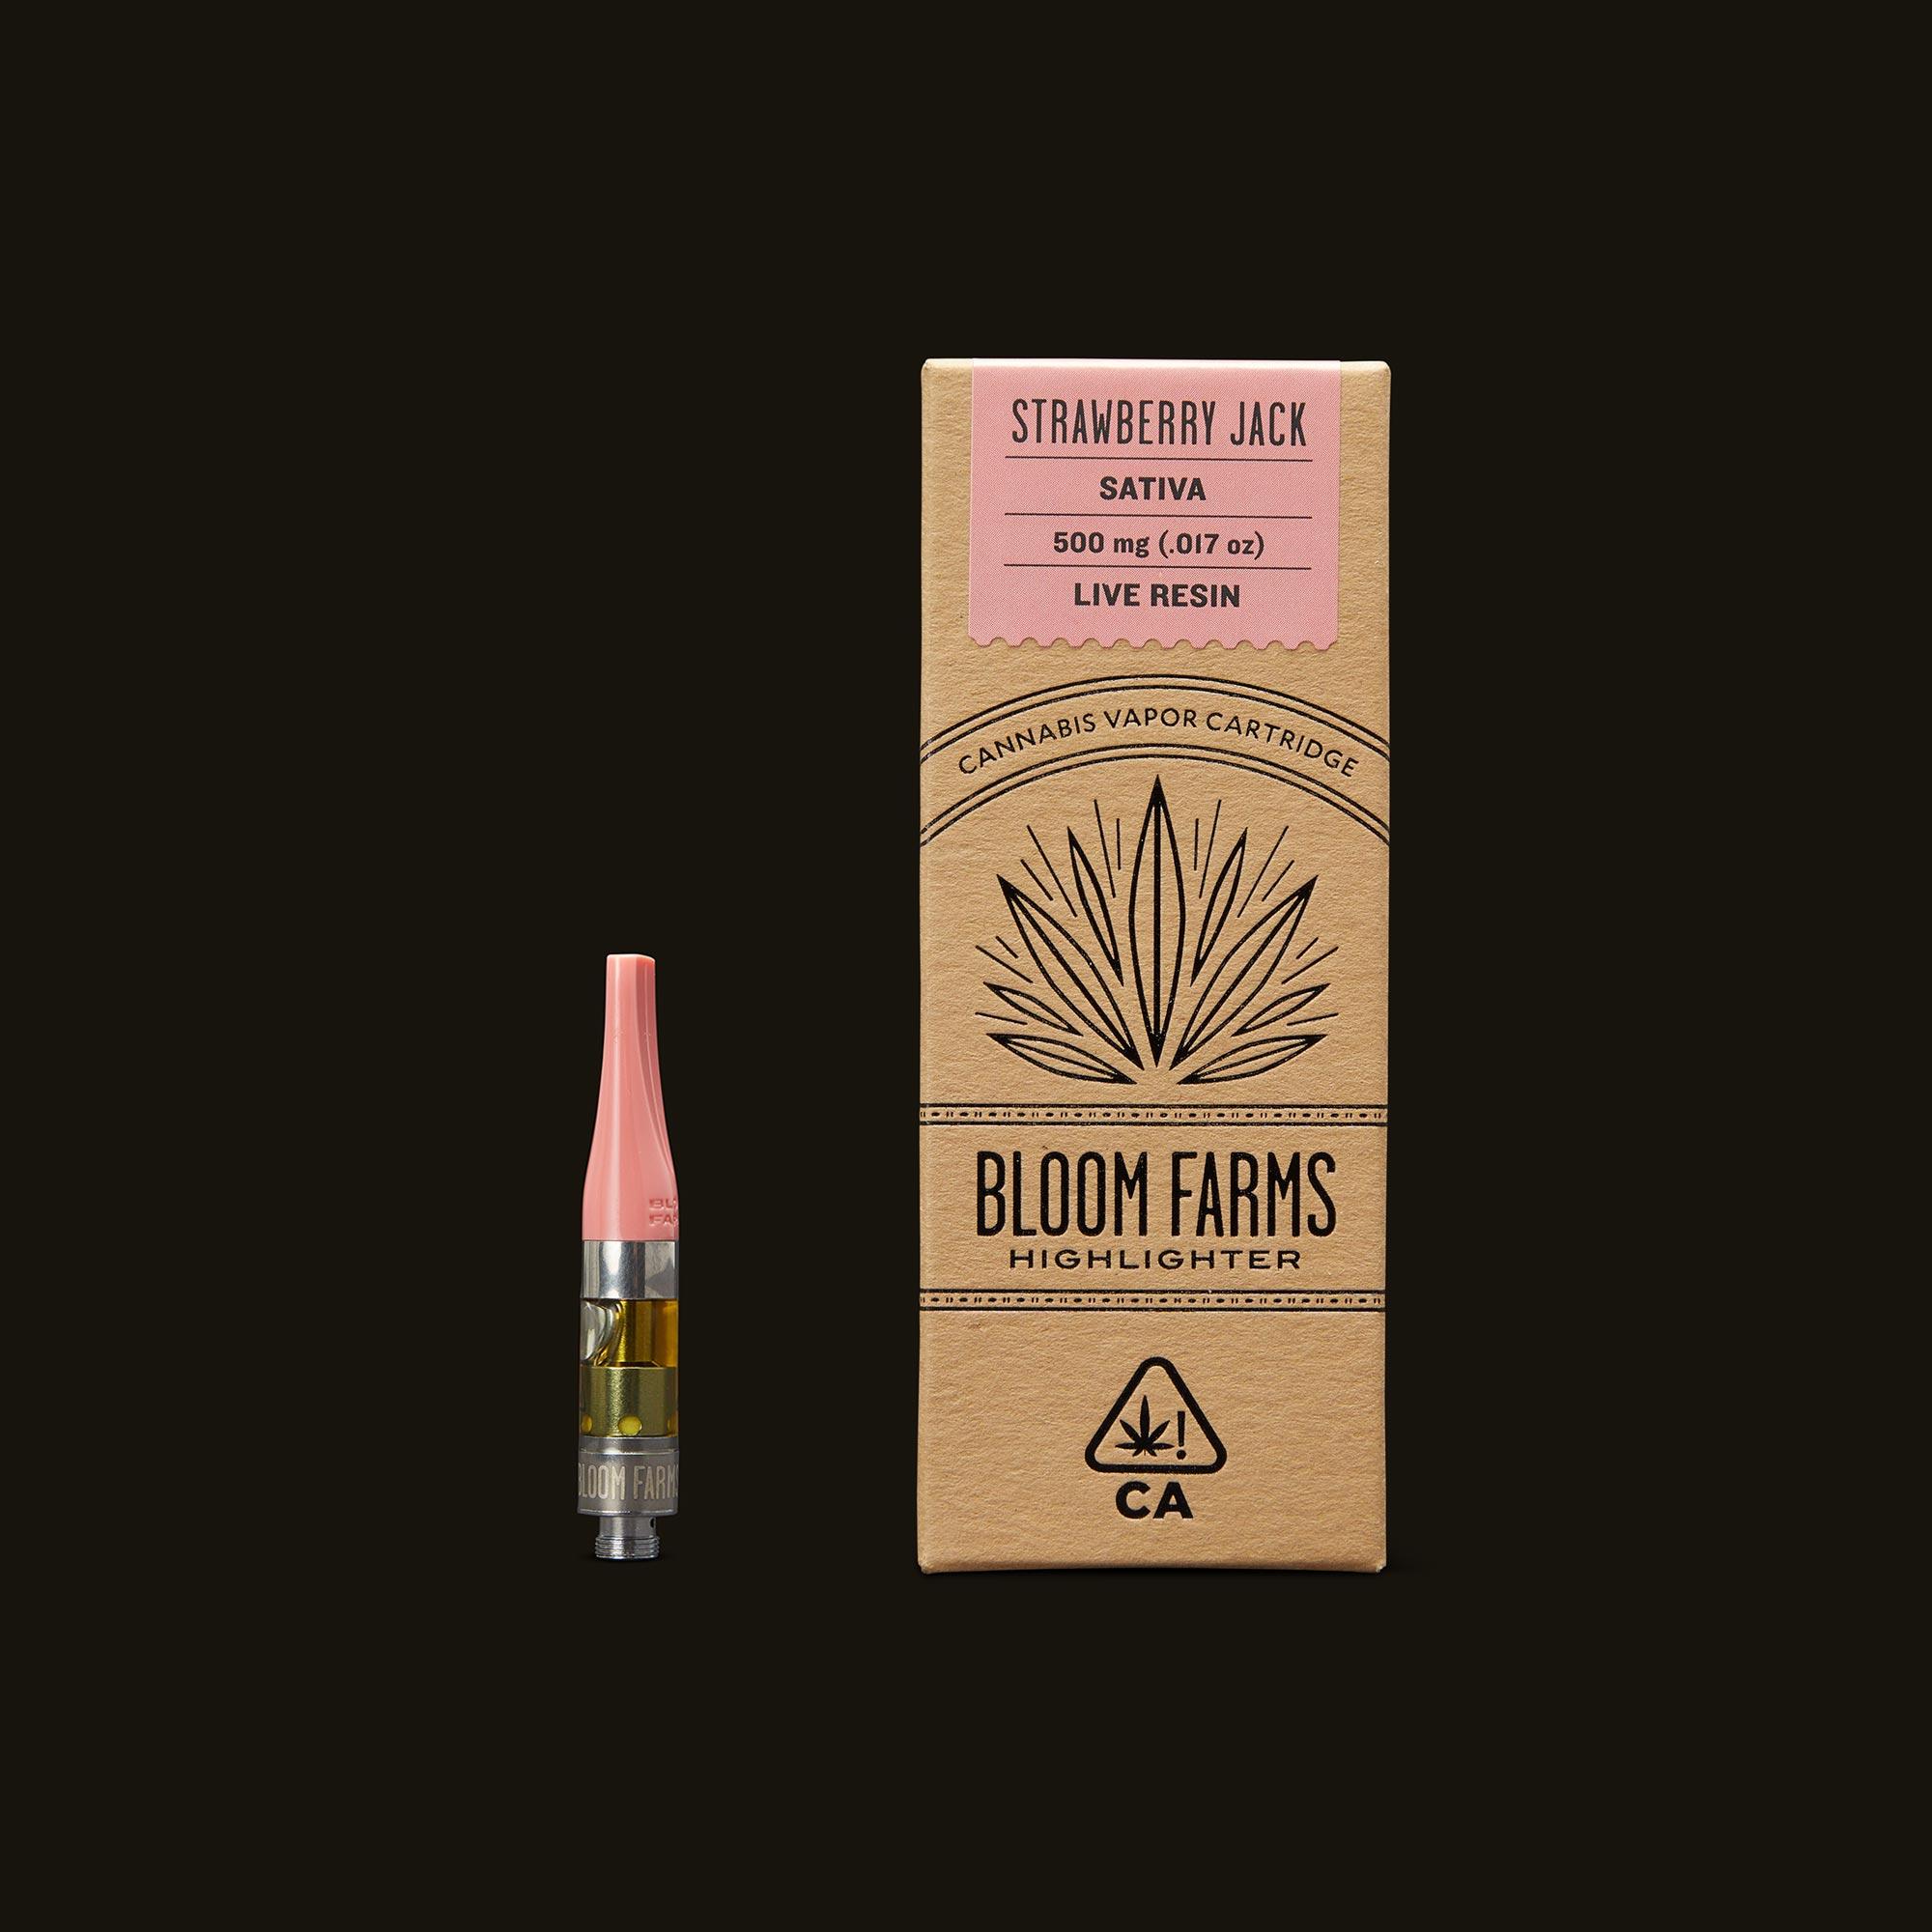 Bloom Farms Strawberry Jack Live Resin Cartridge